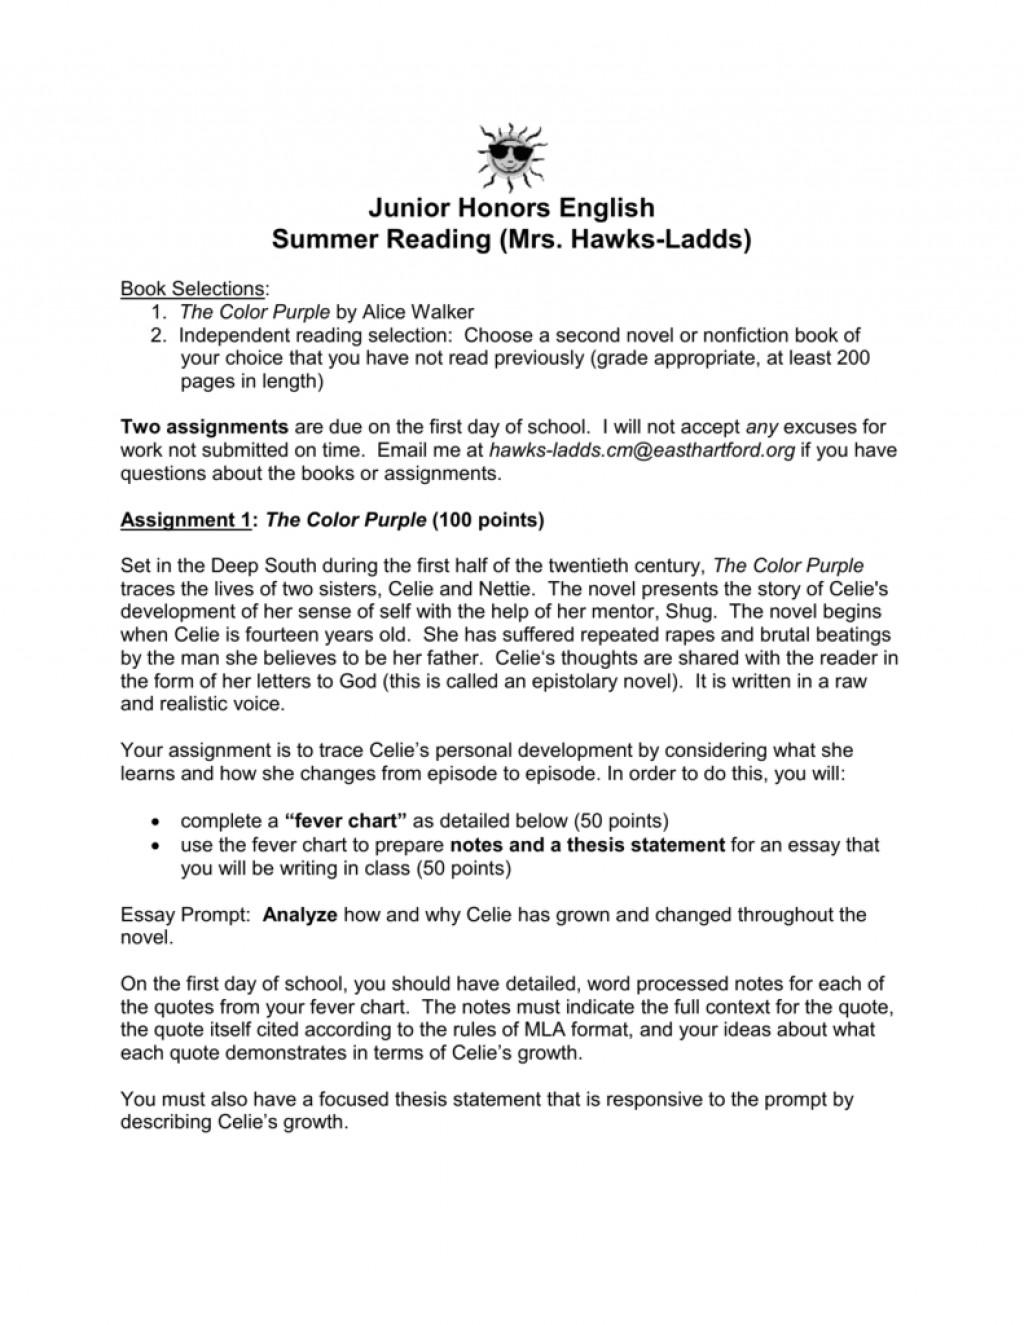 001 The Color Purple Essay 009259708 1 Impressive Research Paper Outline Introduction Large